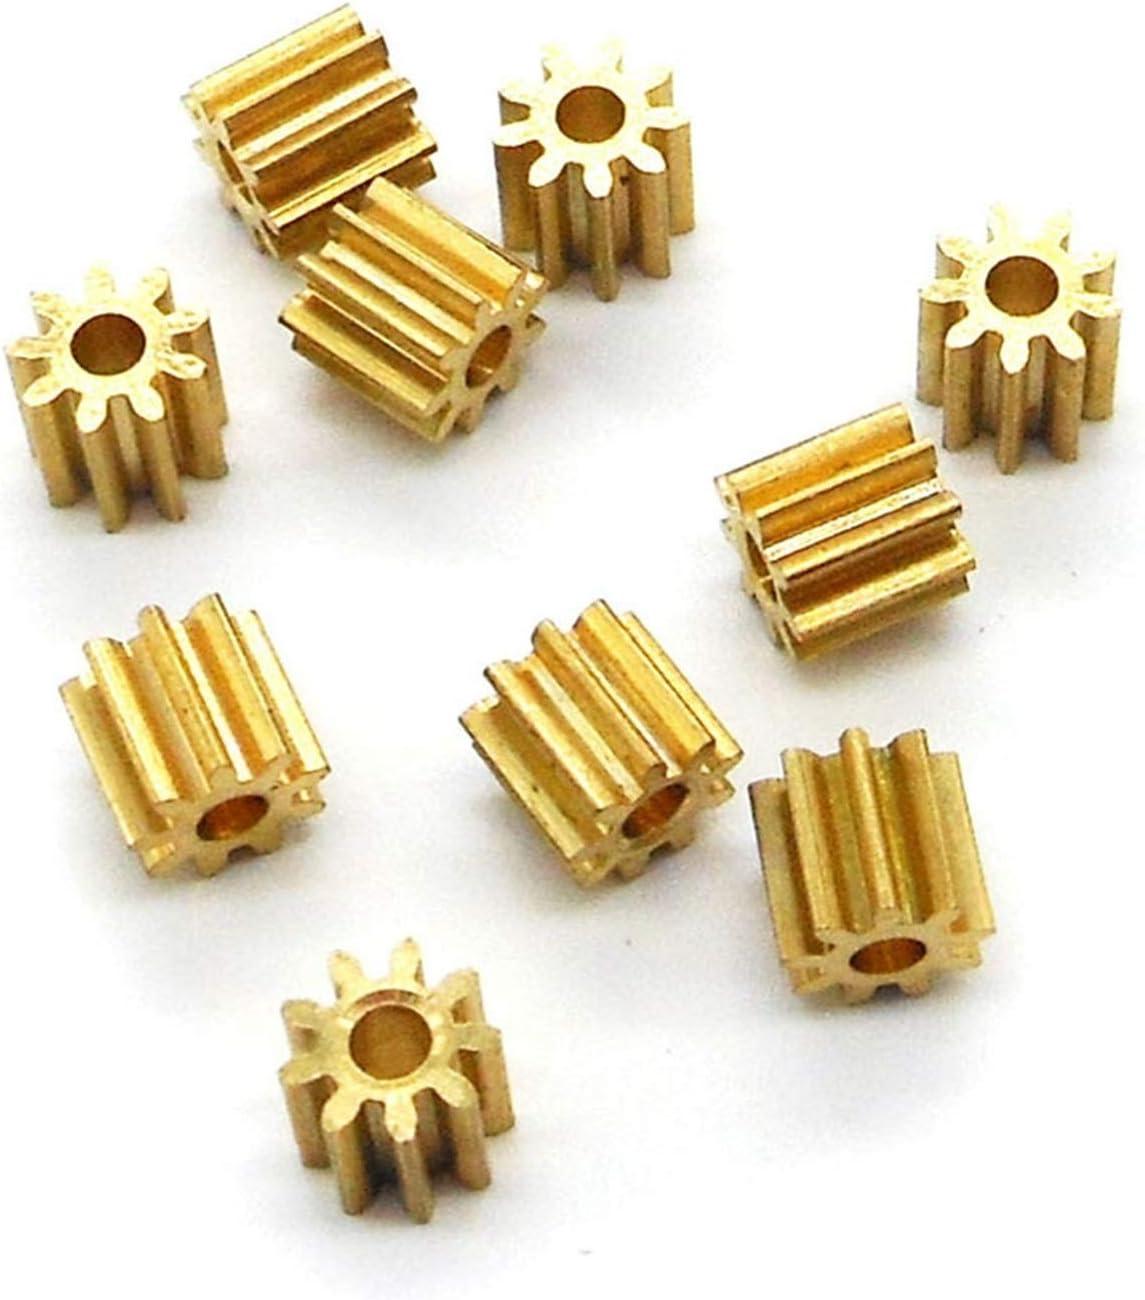 DINGGUANGHE-CUP Durable 92A 91.5A 0.4M Pinion Copper Excellent List price 10pcs Gears